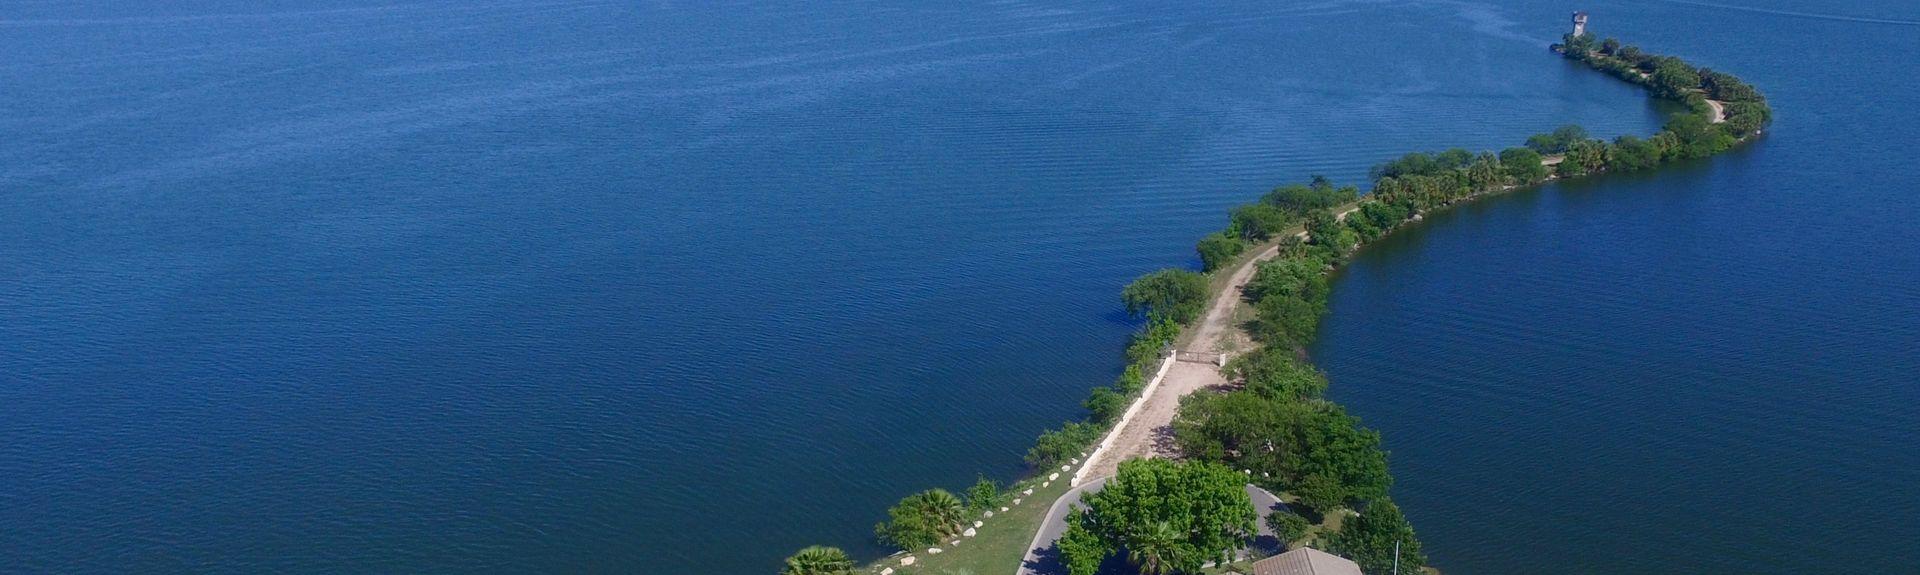 Slick Rock Golf Course, Horseshoe Bay, Texas, United States of America